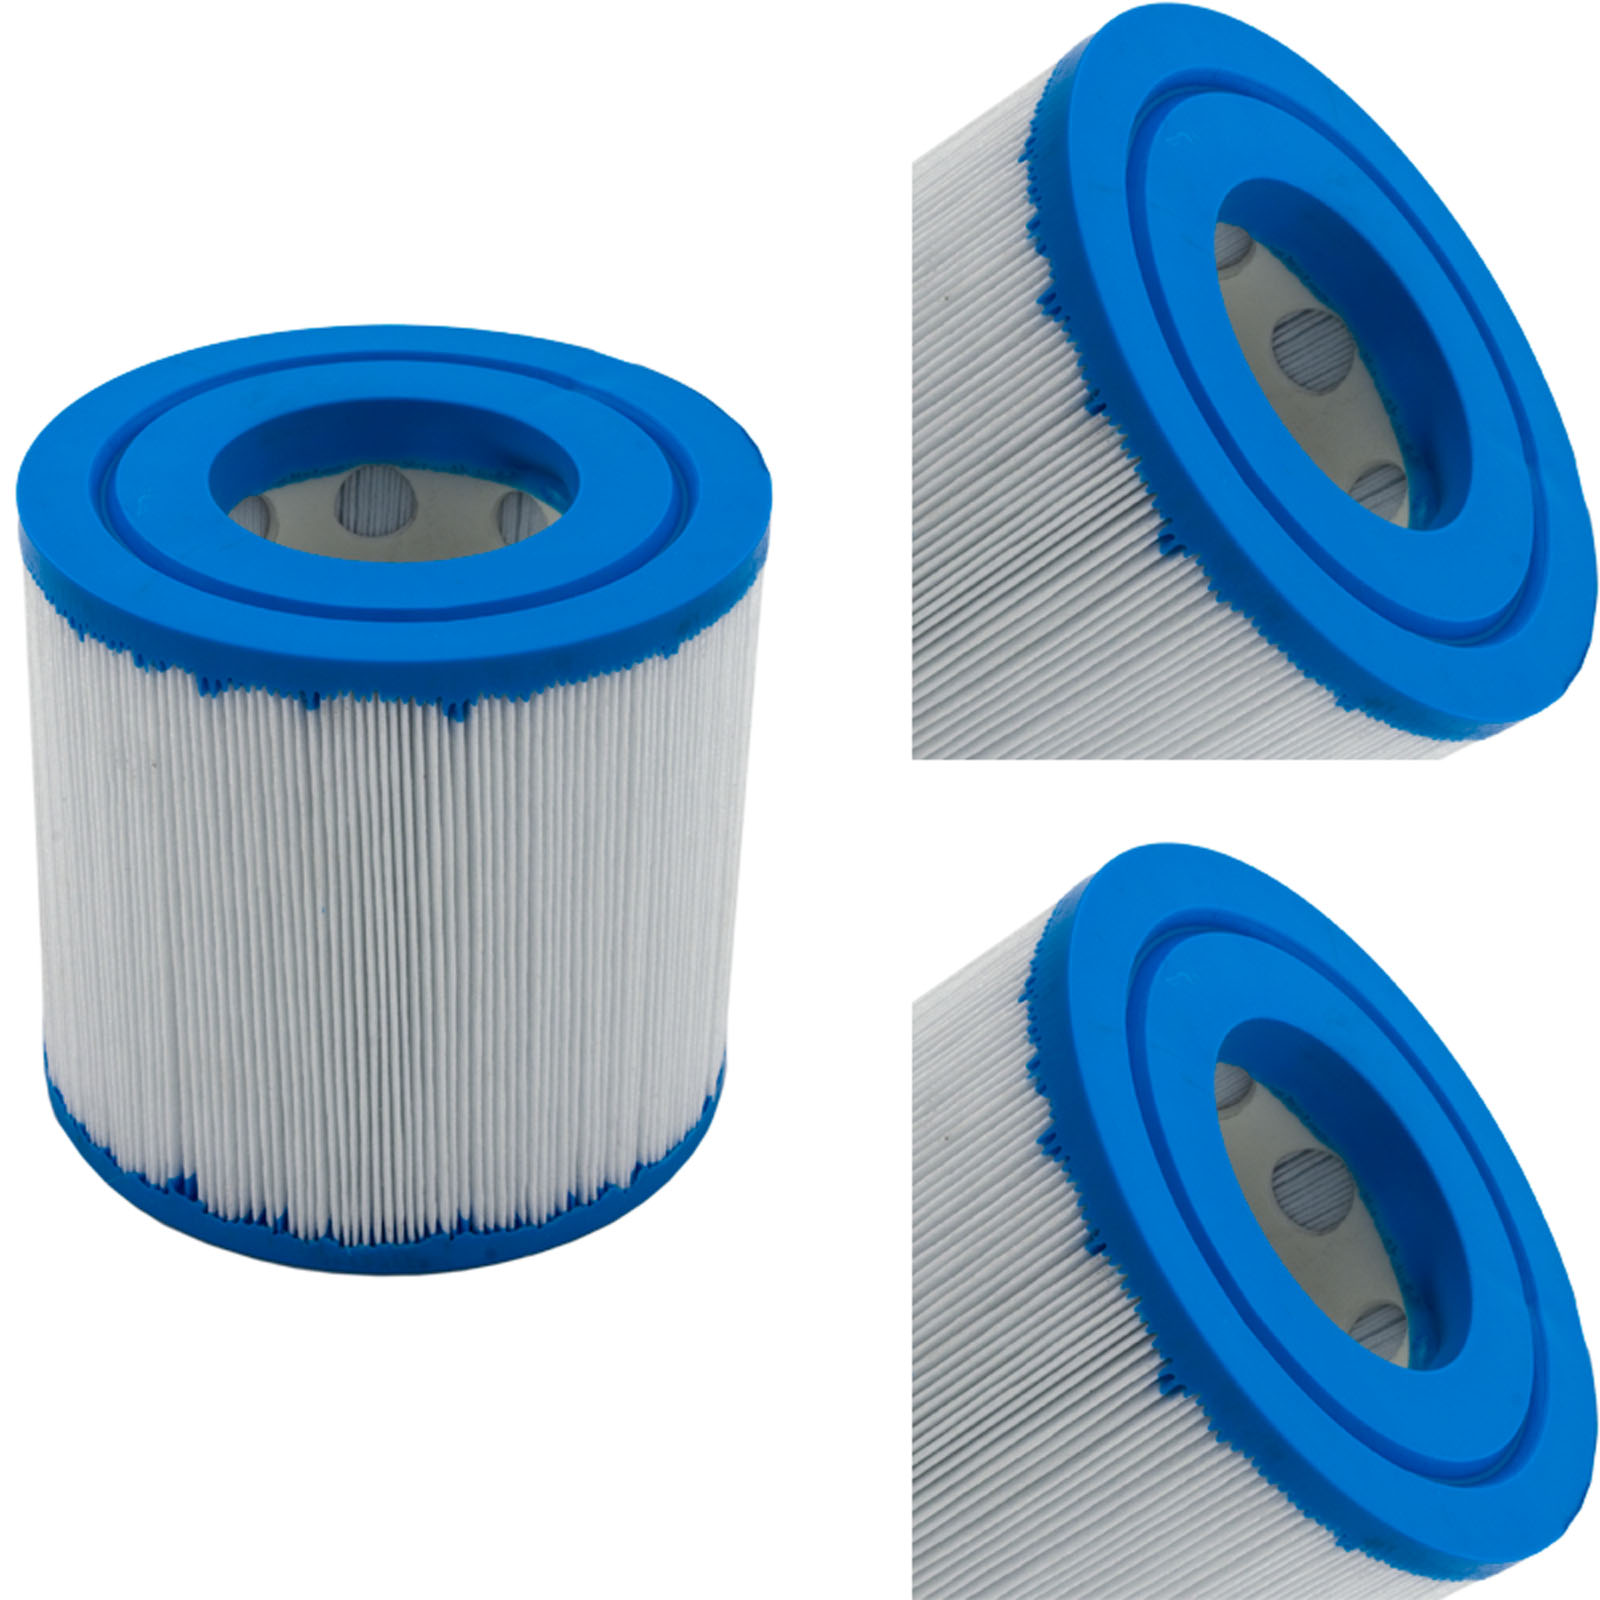 10sqft Waterway Replacement Filter Cartridge - PWW10, C-4310, FC-3077